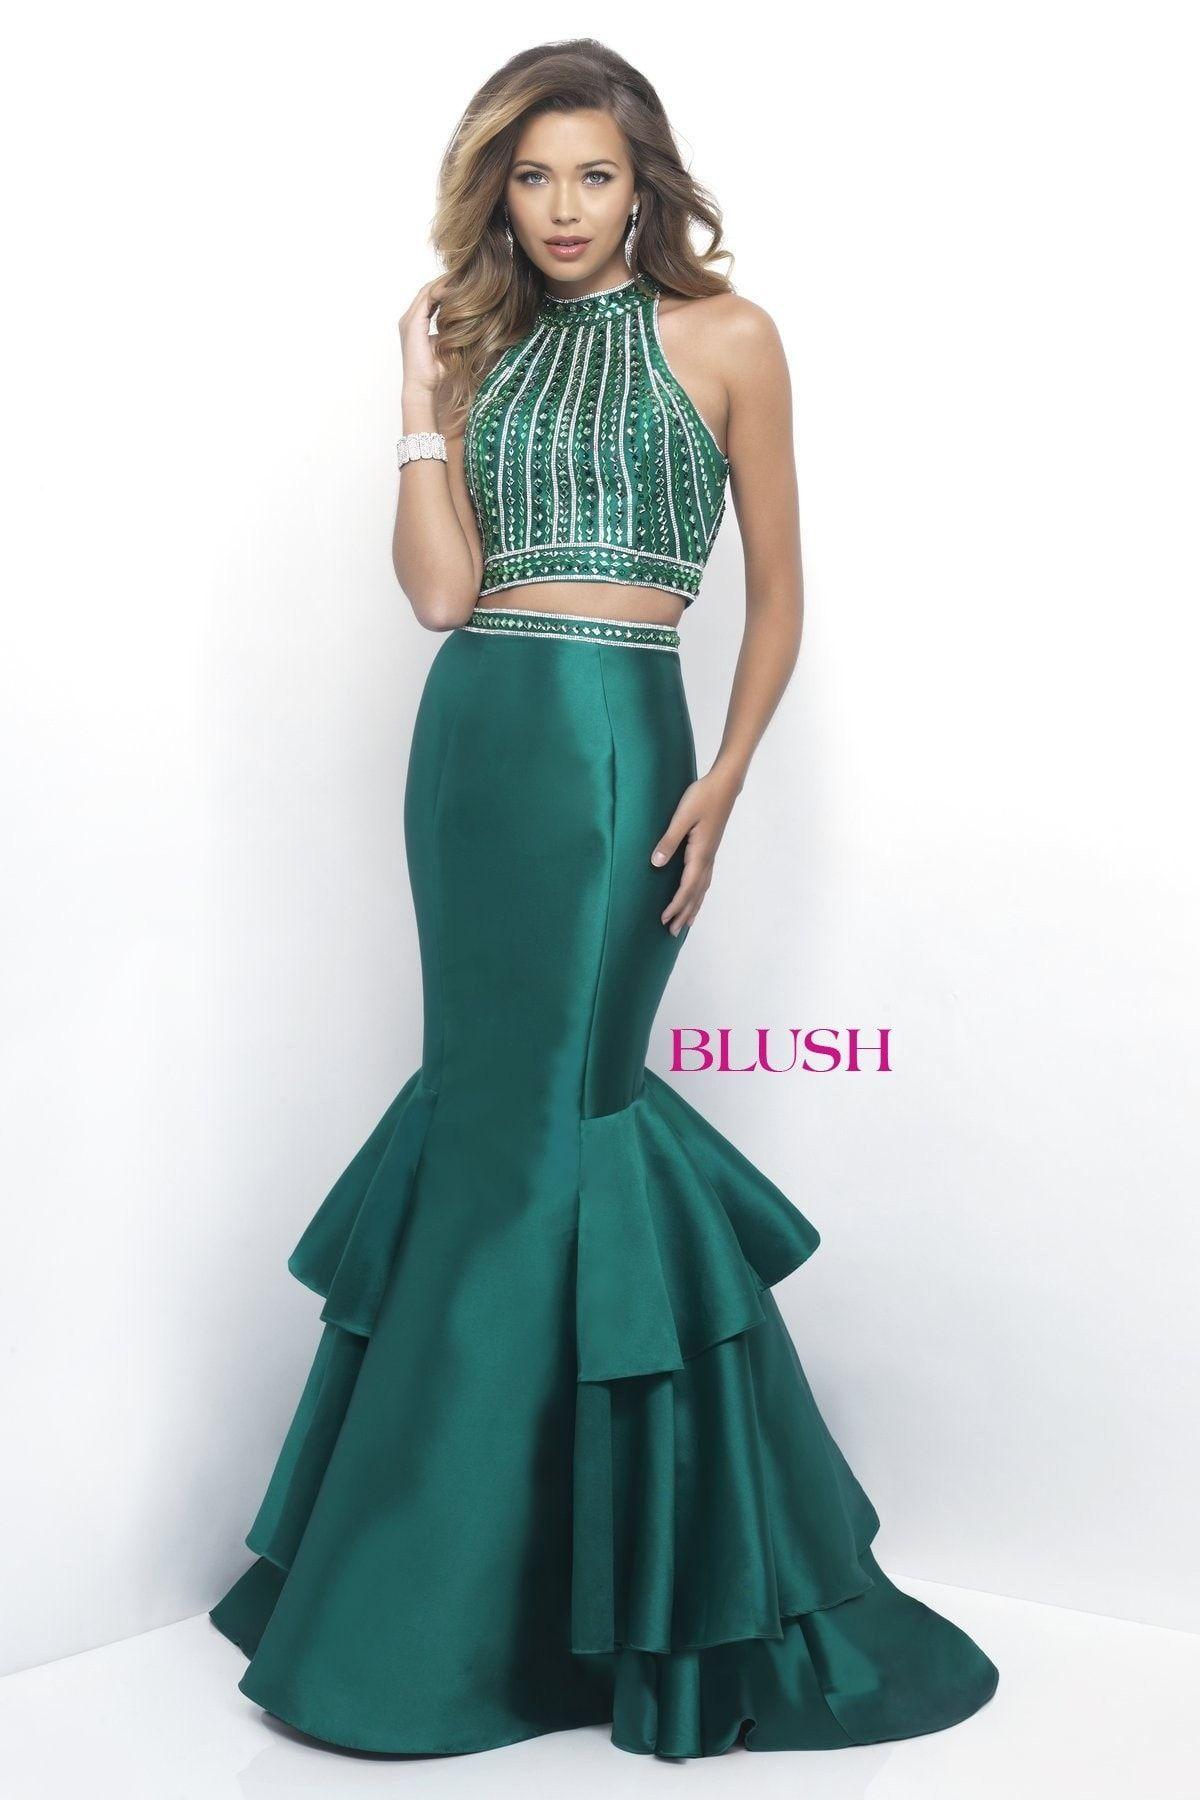 Blush prom emerald high neckline tiered mermaid prom dress